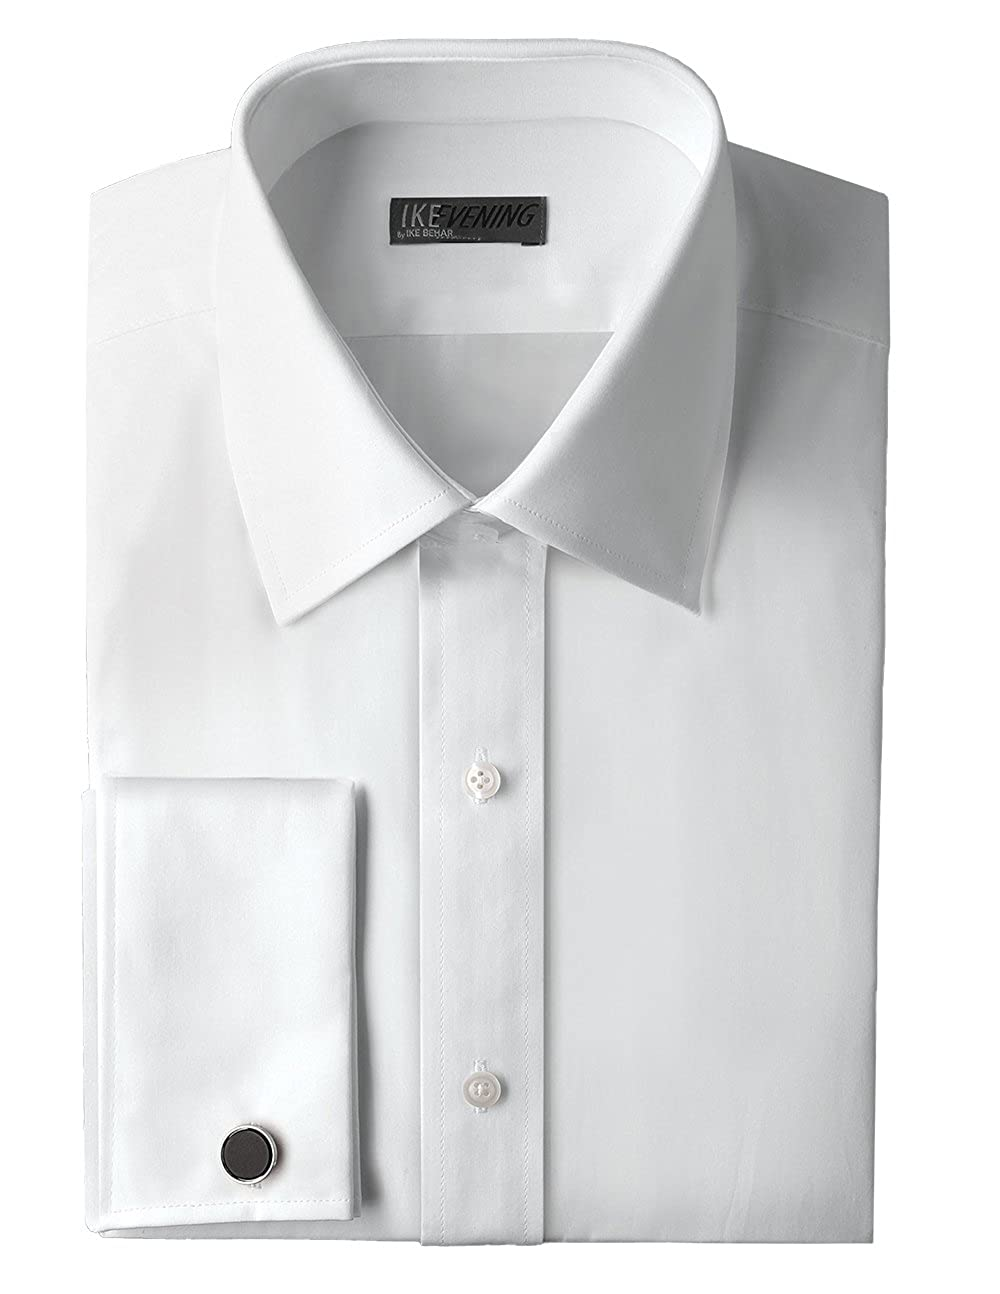 Ike Behar Traditional Fit 100/% Woven Cotton Tuxedo Dress Shirt